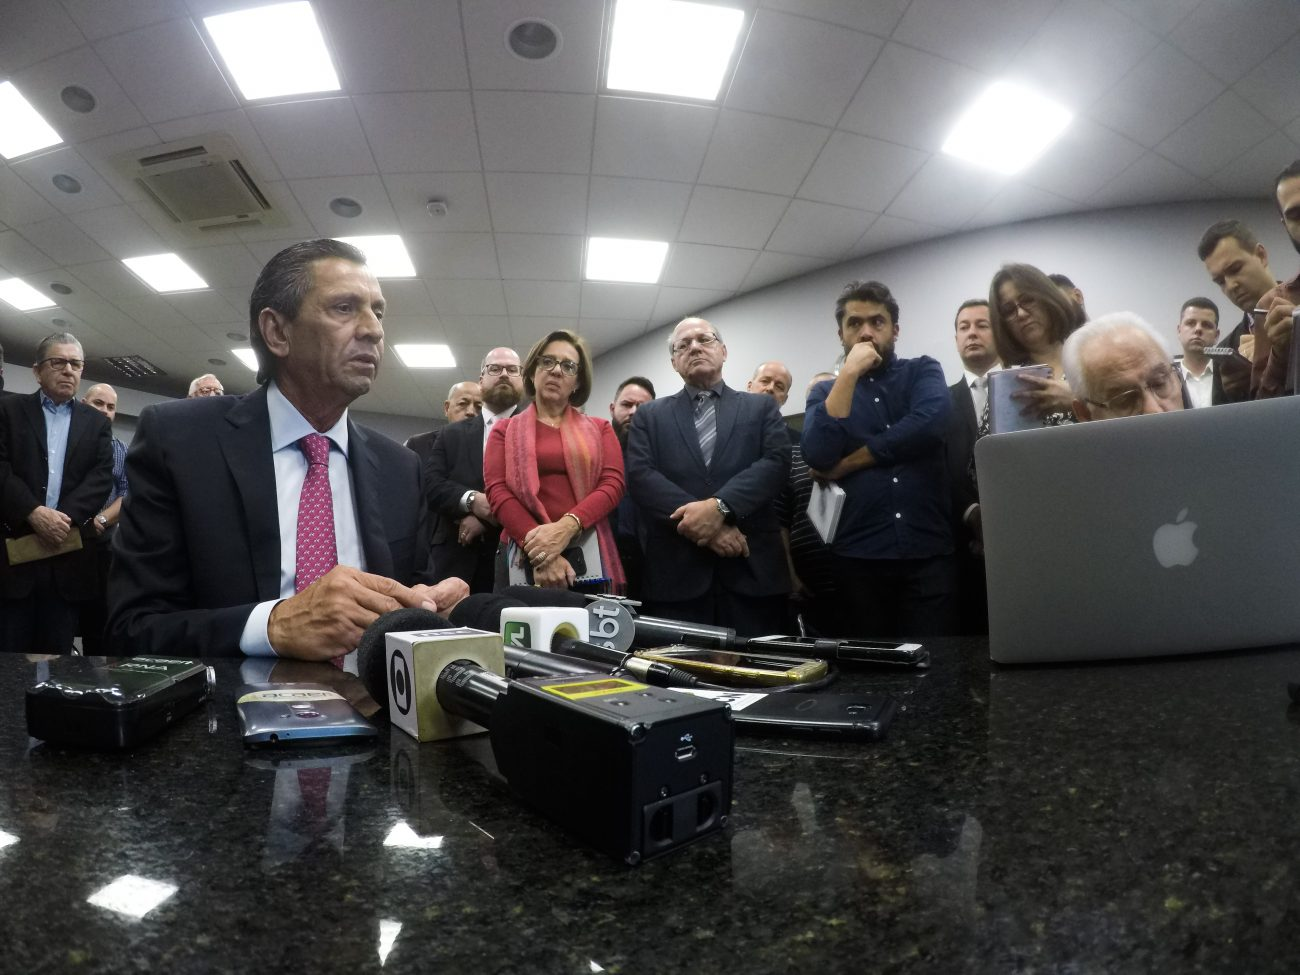 DCIM100GOPROG0254717.JPG - Fábio Queiroz/Agência AL/ND